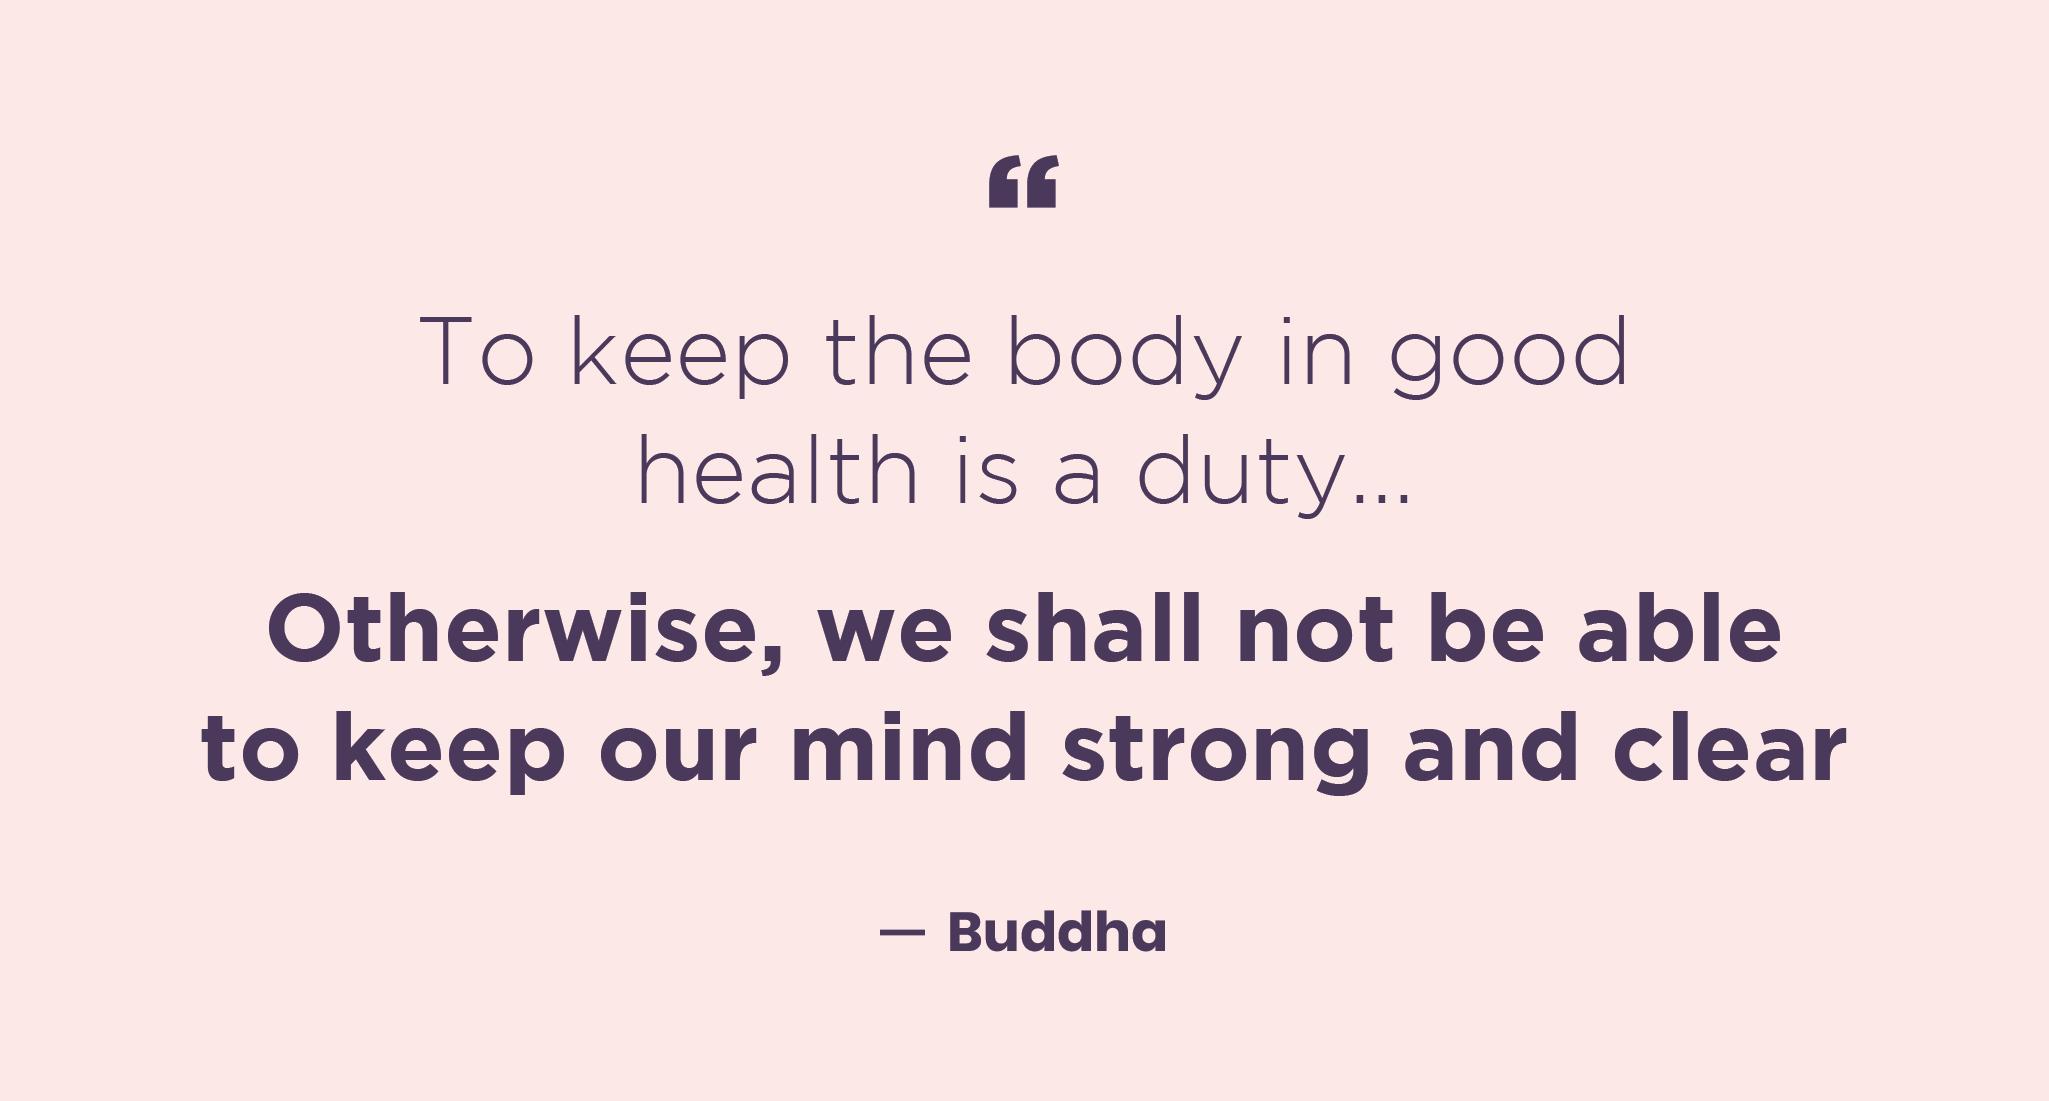 Buddha inspirational quotes on life